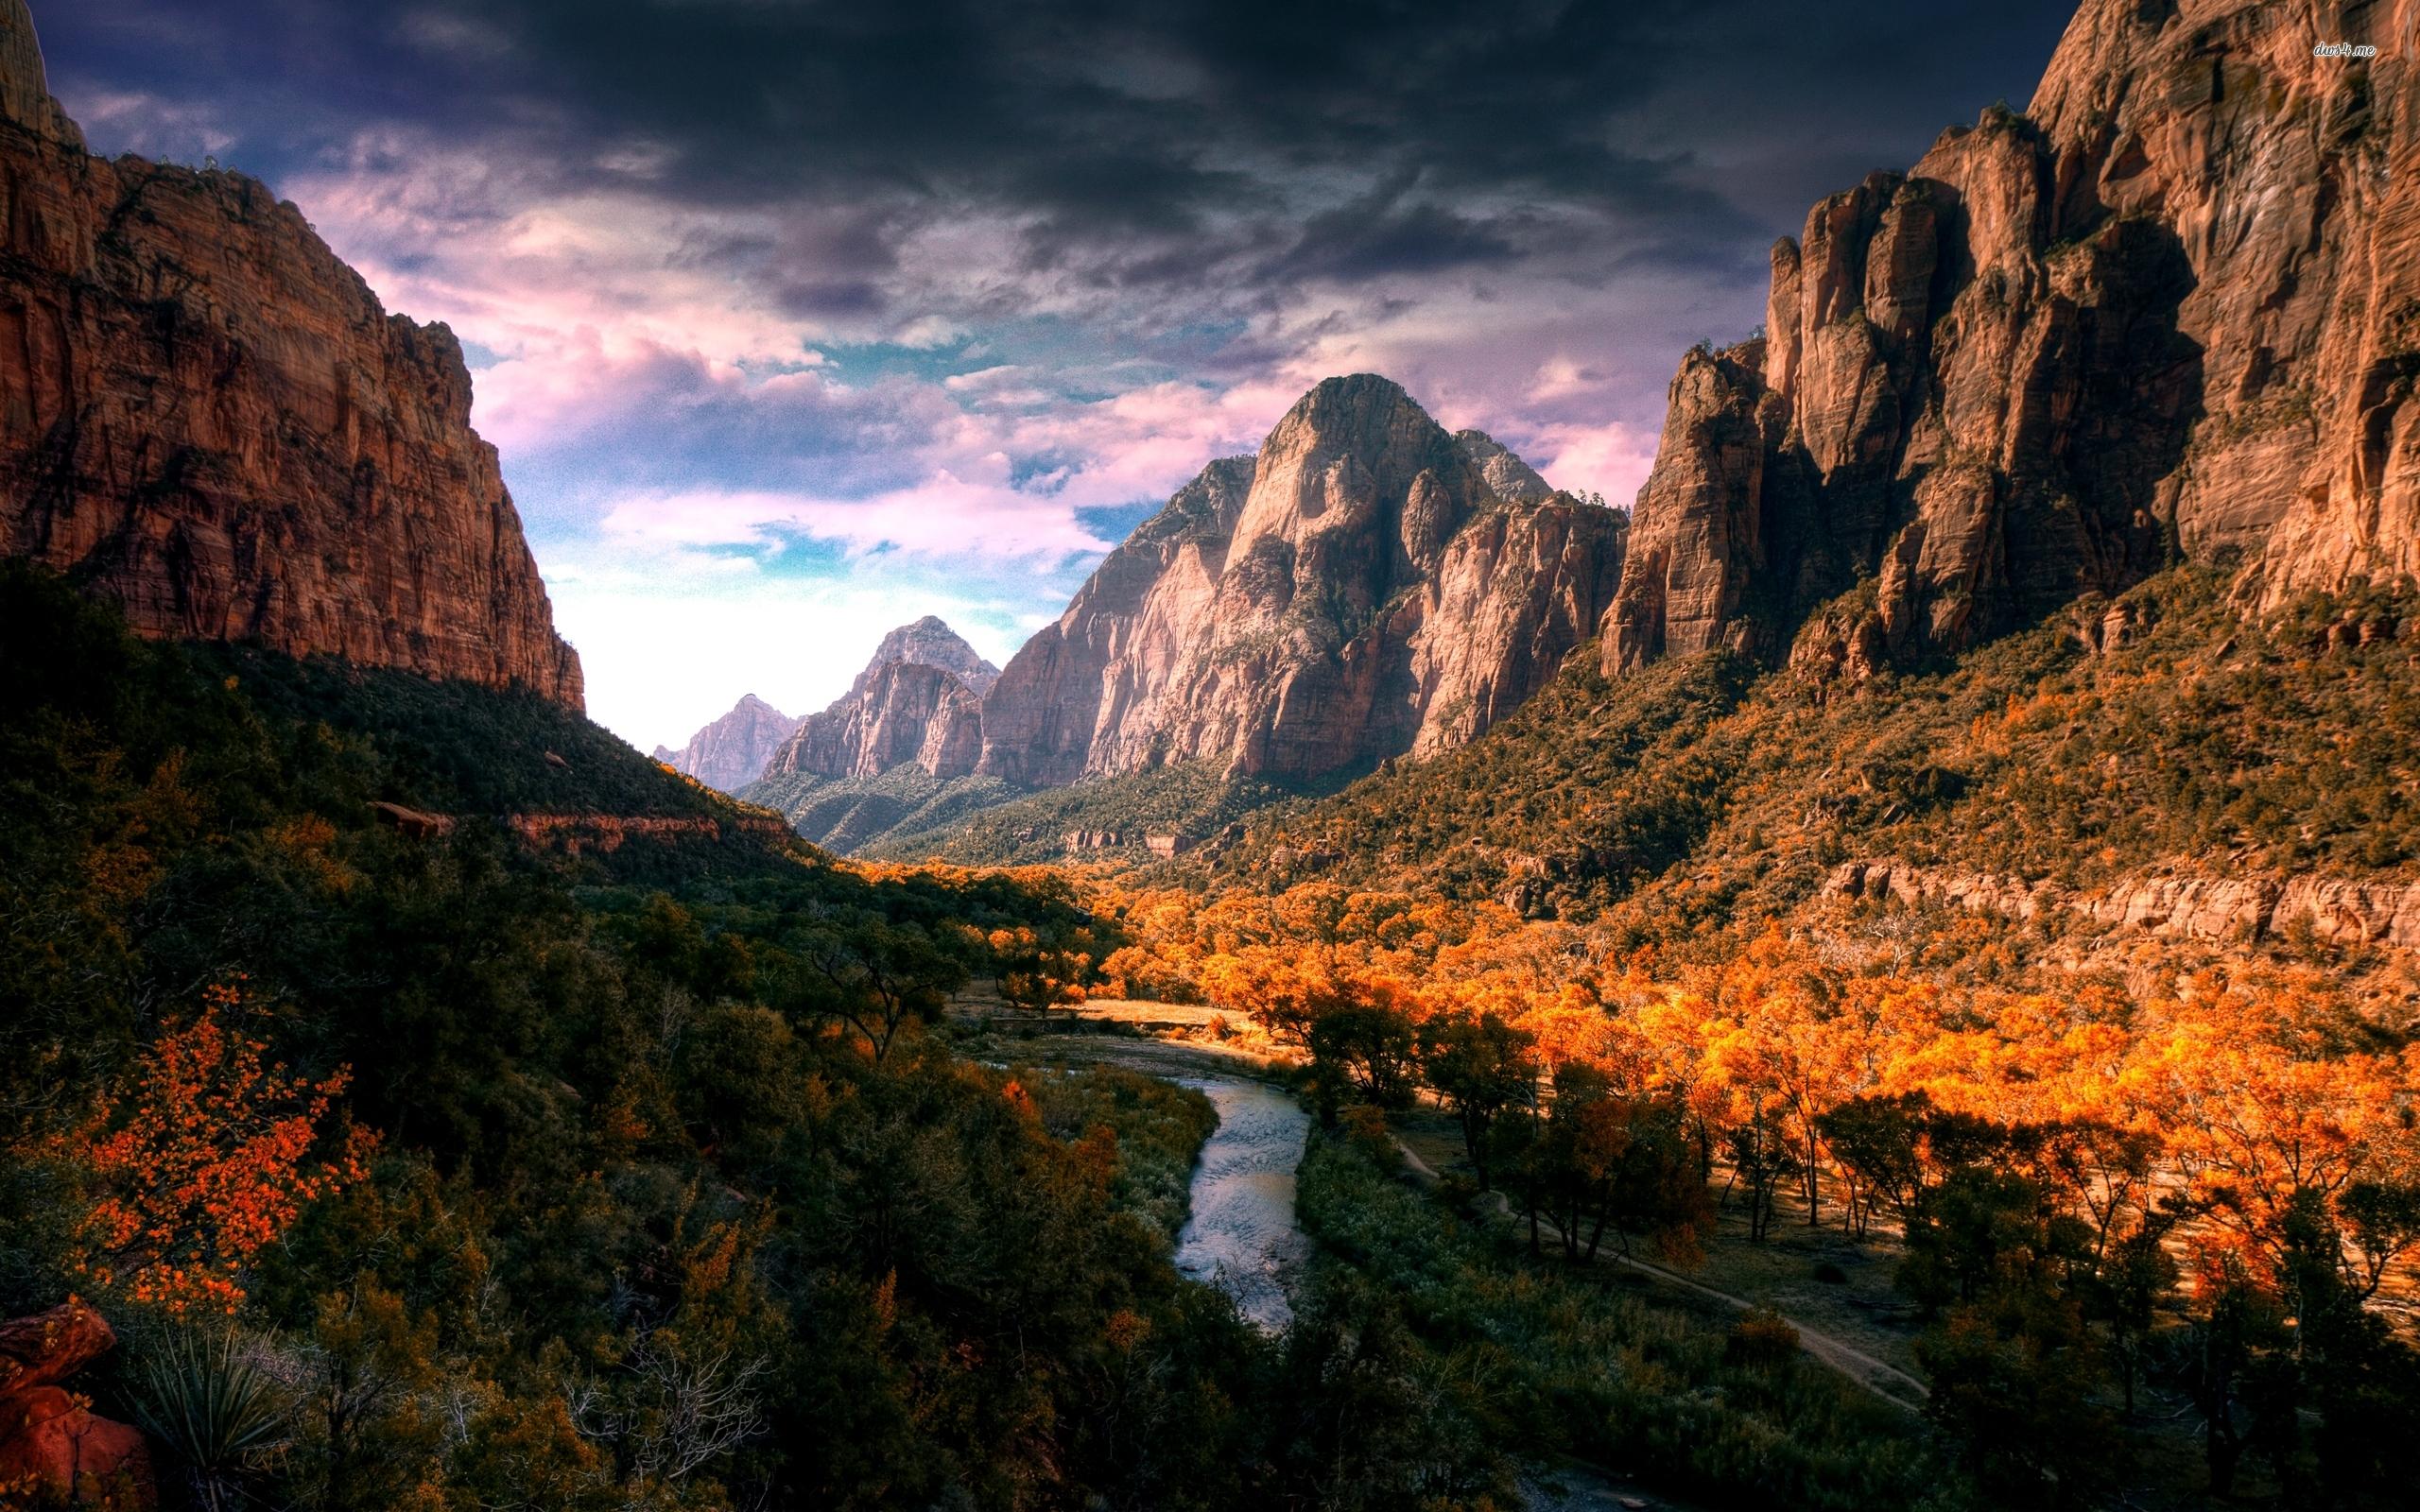 Zion National Park Desktop Wallpaper Wallpapersafari